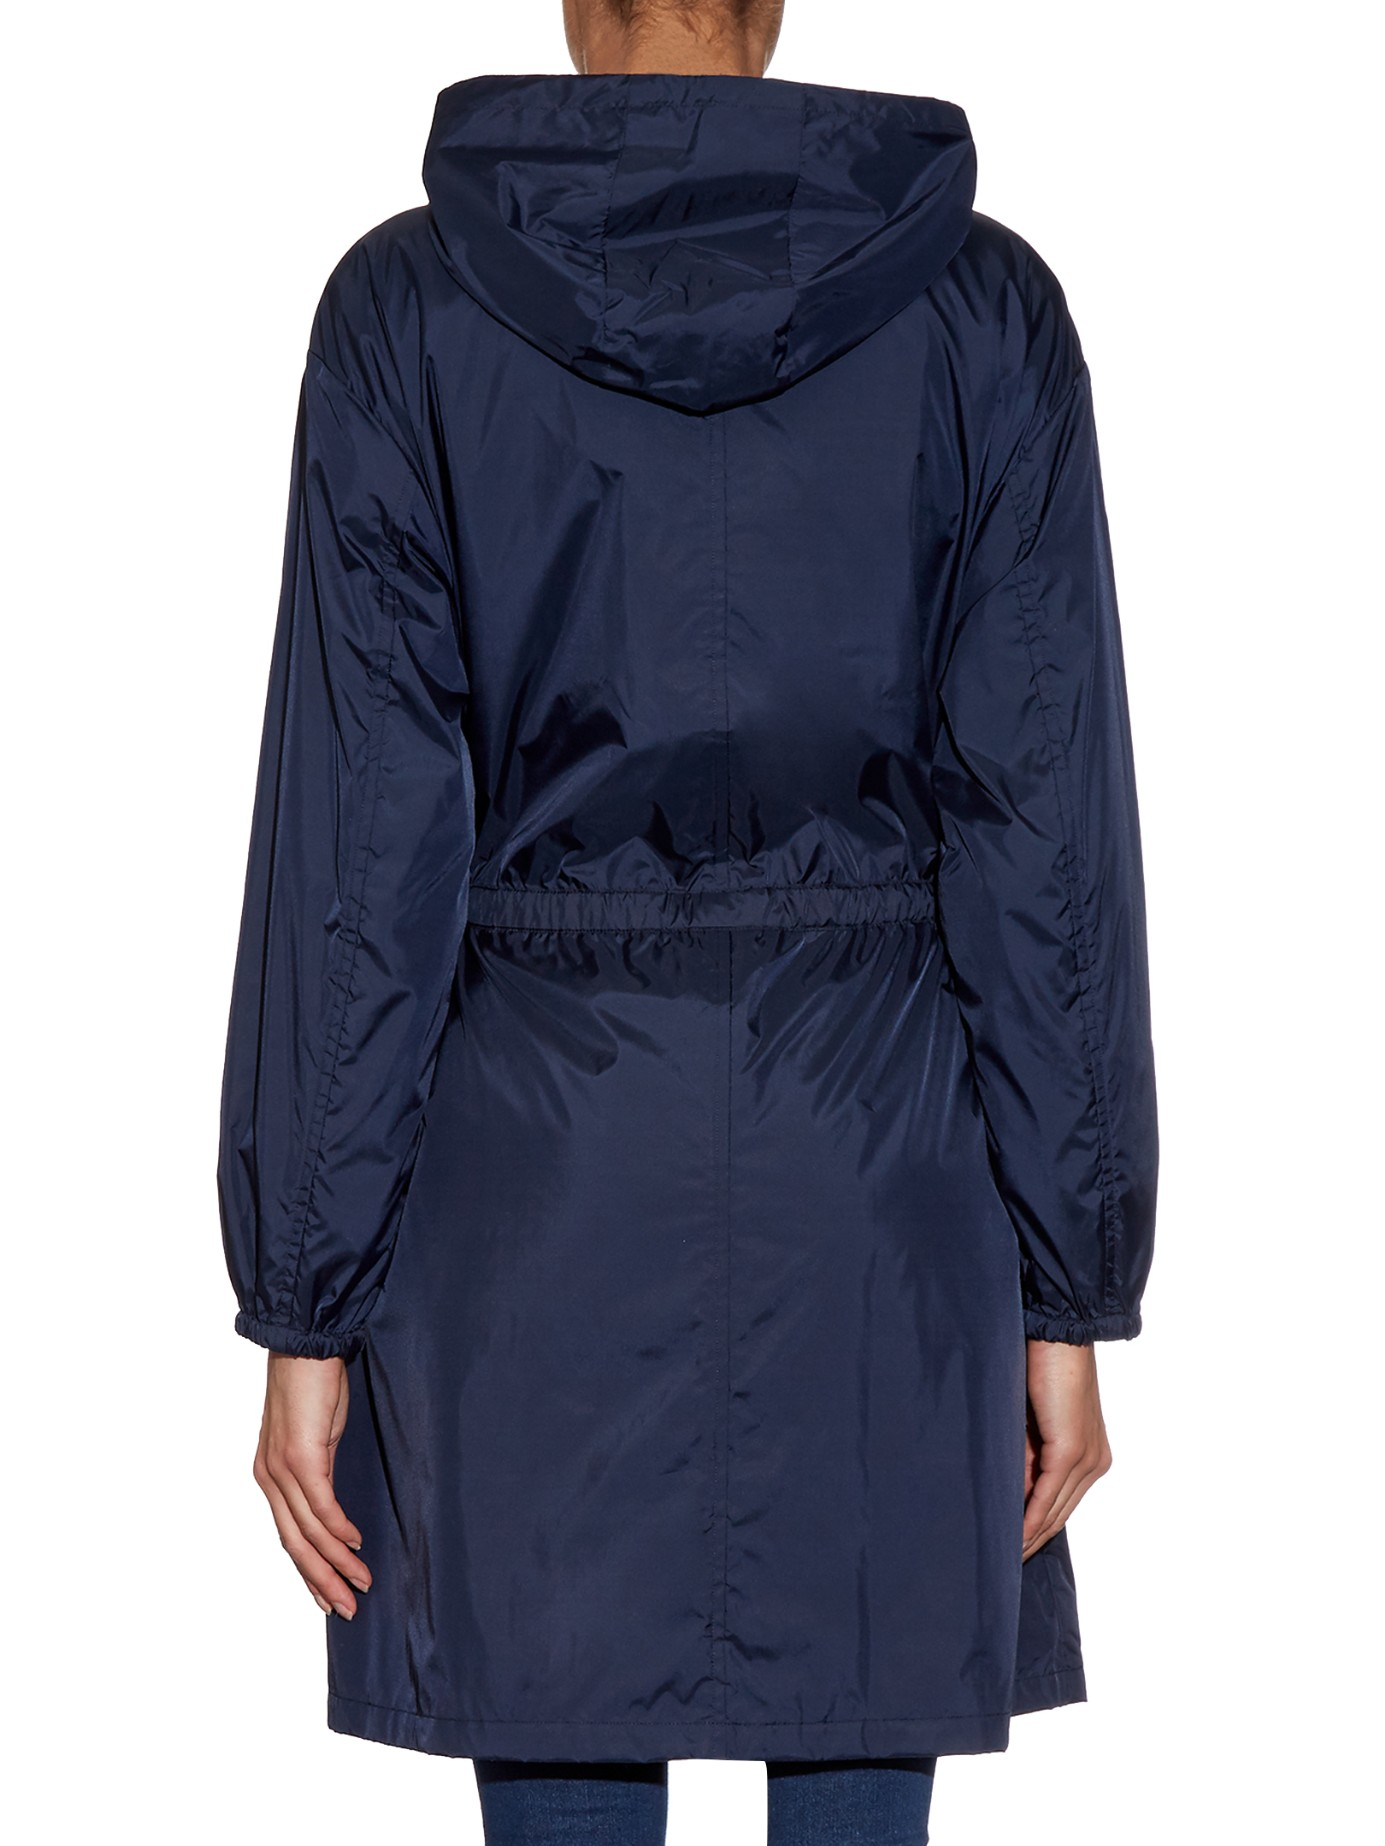 Lyst S Max Mara Parka Raincoat In Blue